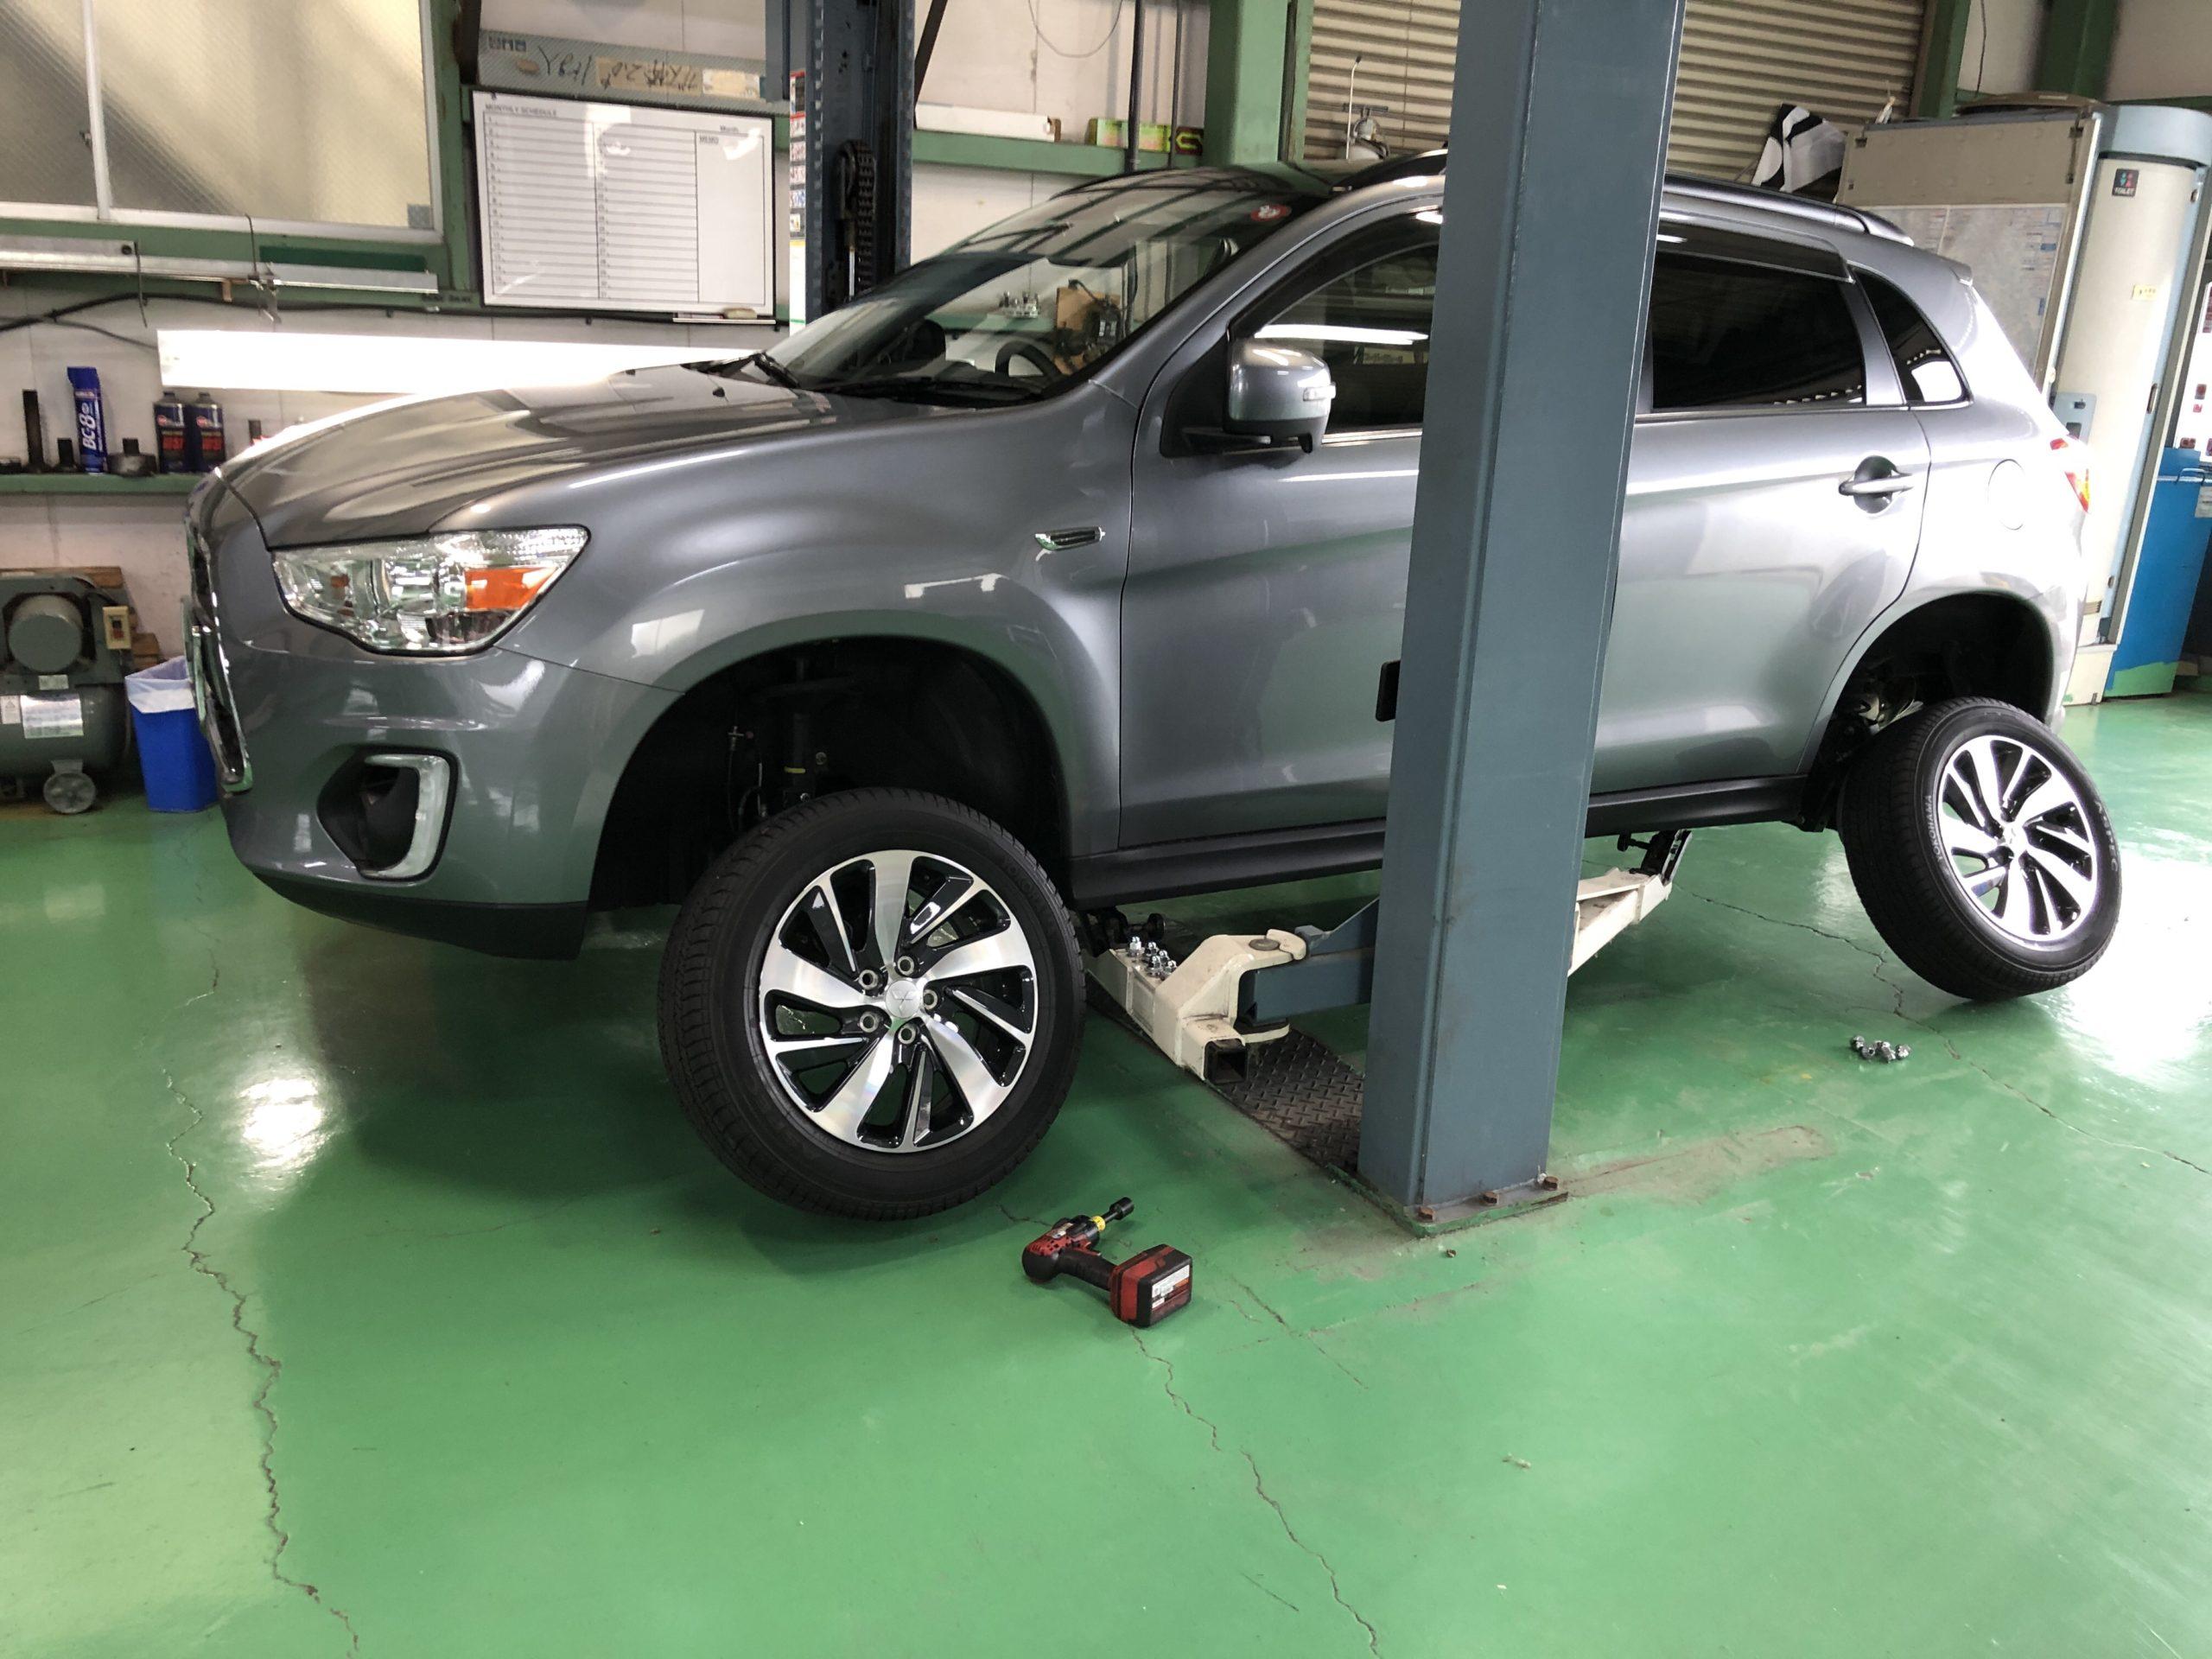 GA4WRVR スタッドレス→夏タイヤ履き替え❗️練馬区N様GA4WRVR